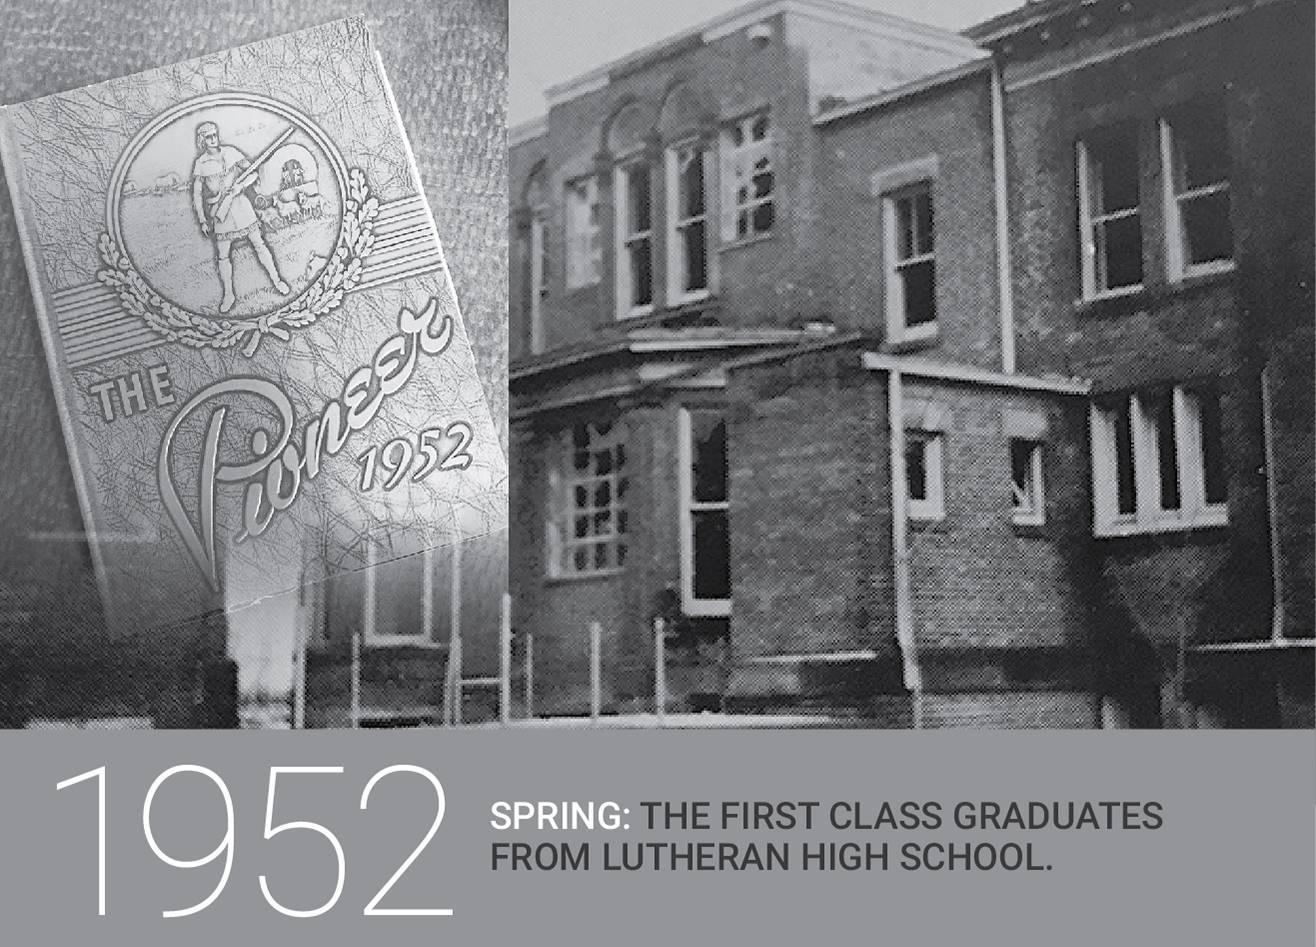 History-1952-First-Class-Graduates